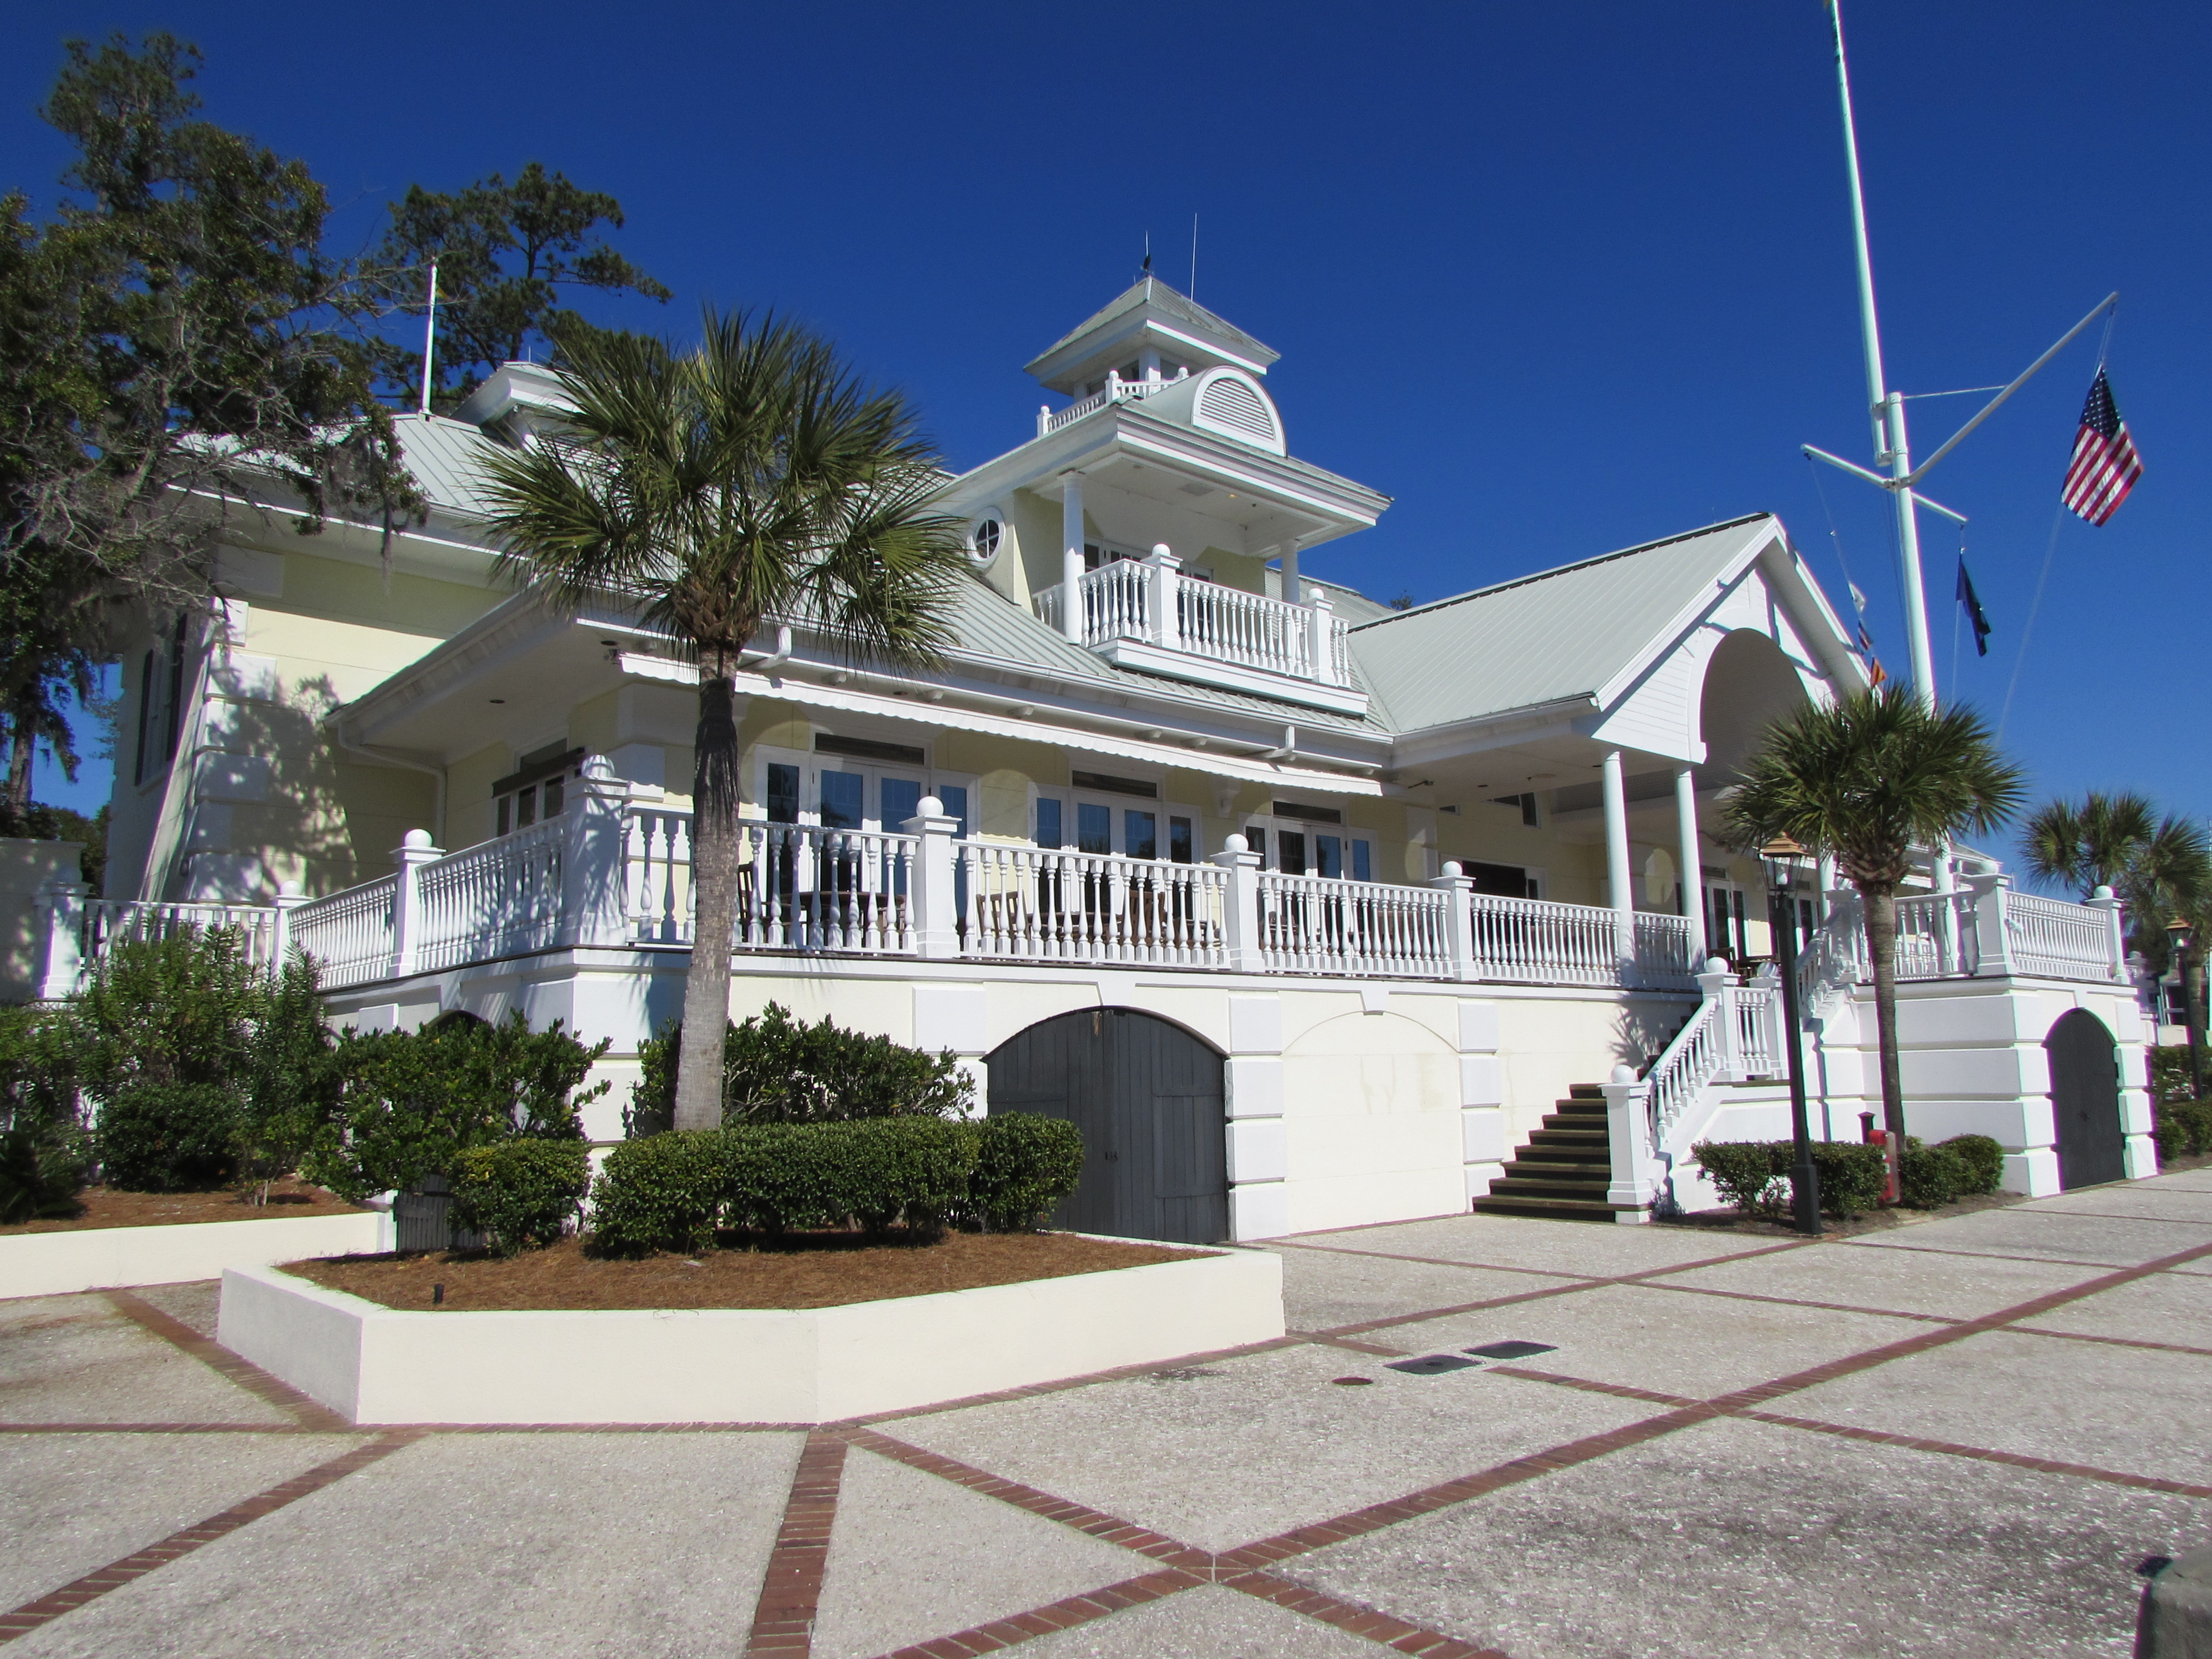 Home of the South Carolina Yacht Club Hilton Head Island Windmill Harbour